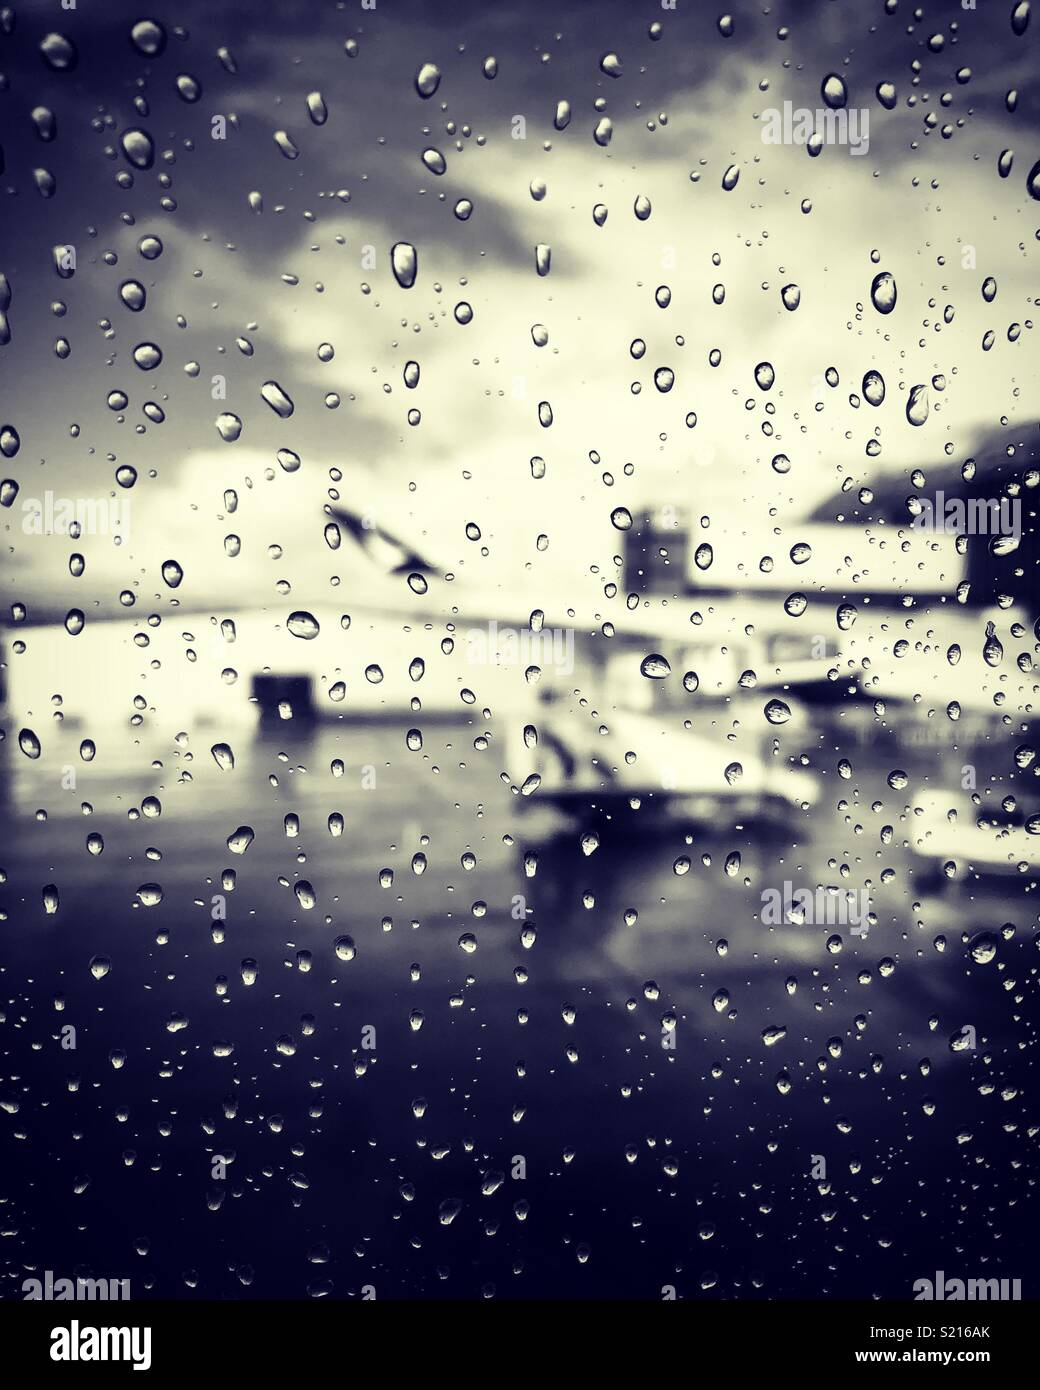 Arty shot from the aeroplane window - Stock Image